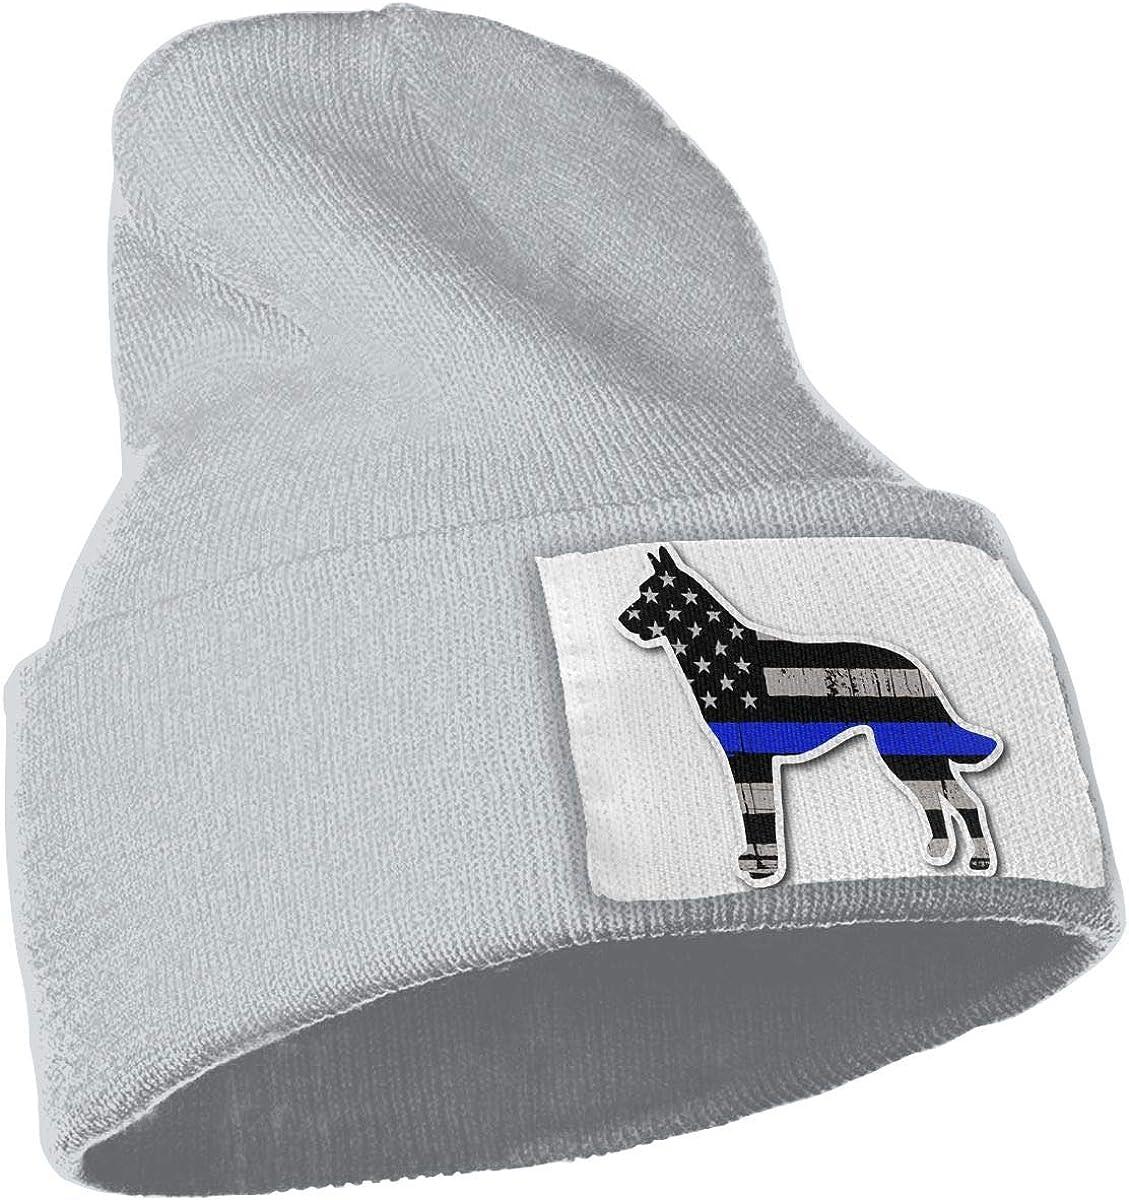 QZqDQ Blue Line K9 Dog Unisex Fashion Knitted Hat Luxury Hip-Hop Cap